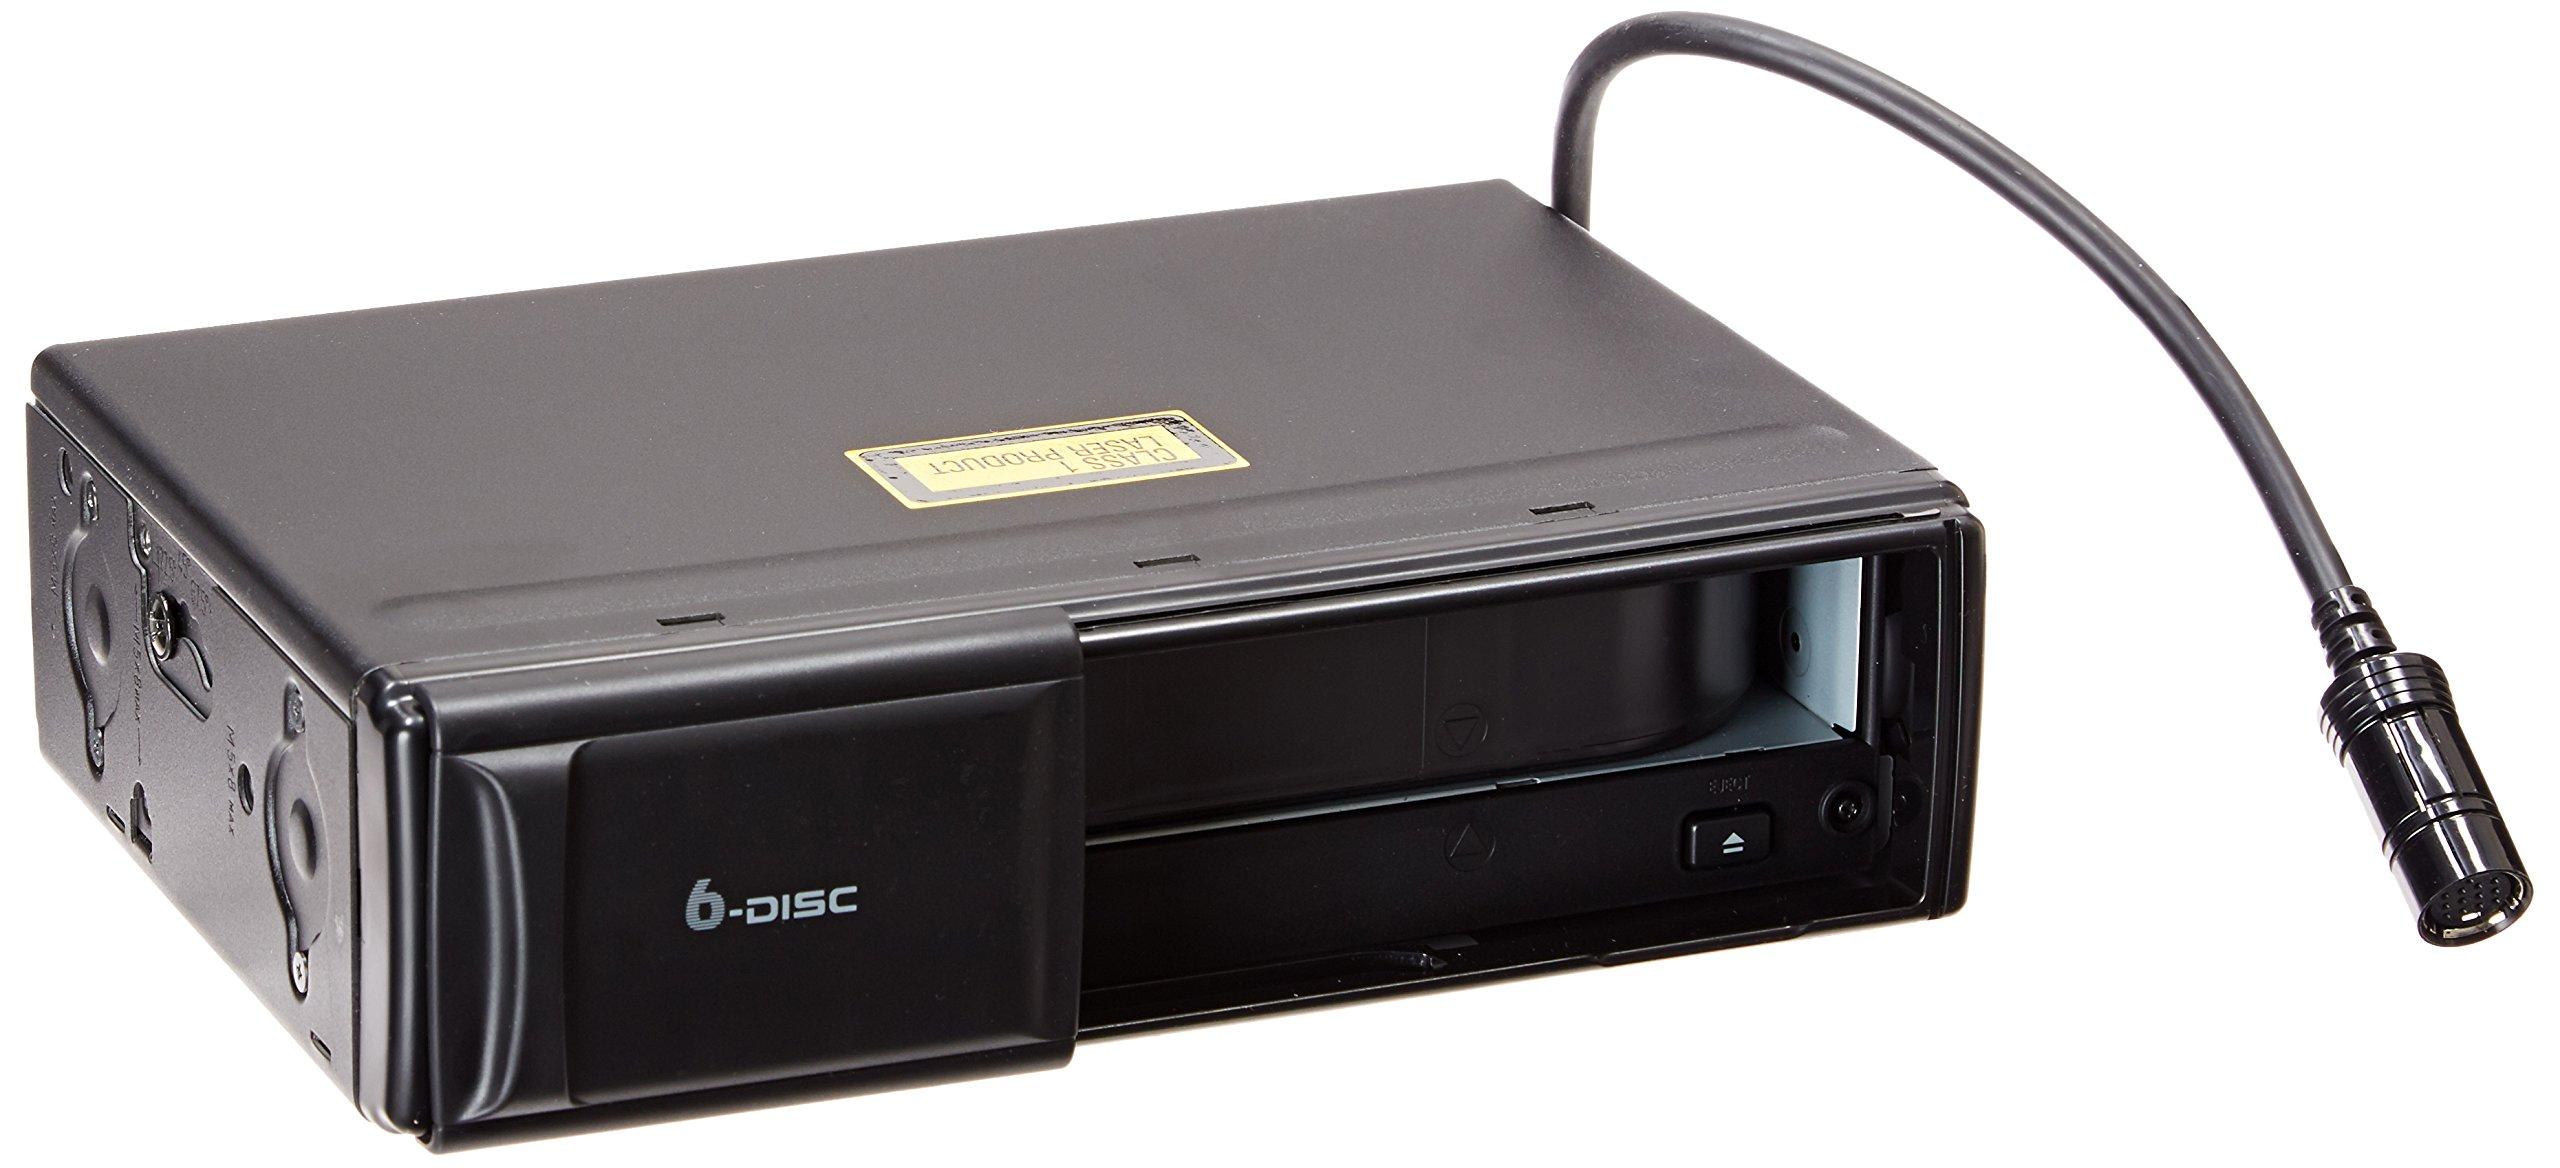 AUDI Genuine (4B0057111A) CD Changer